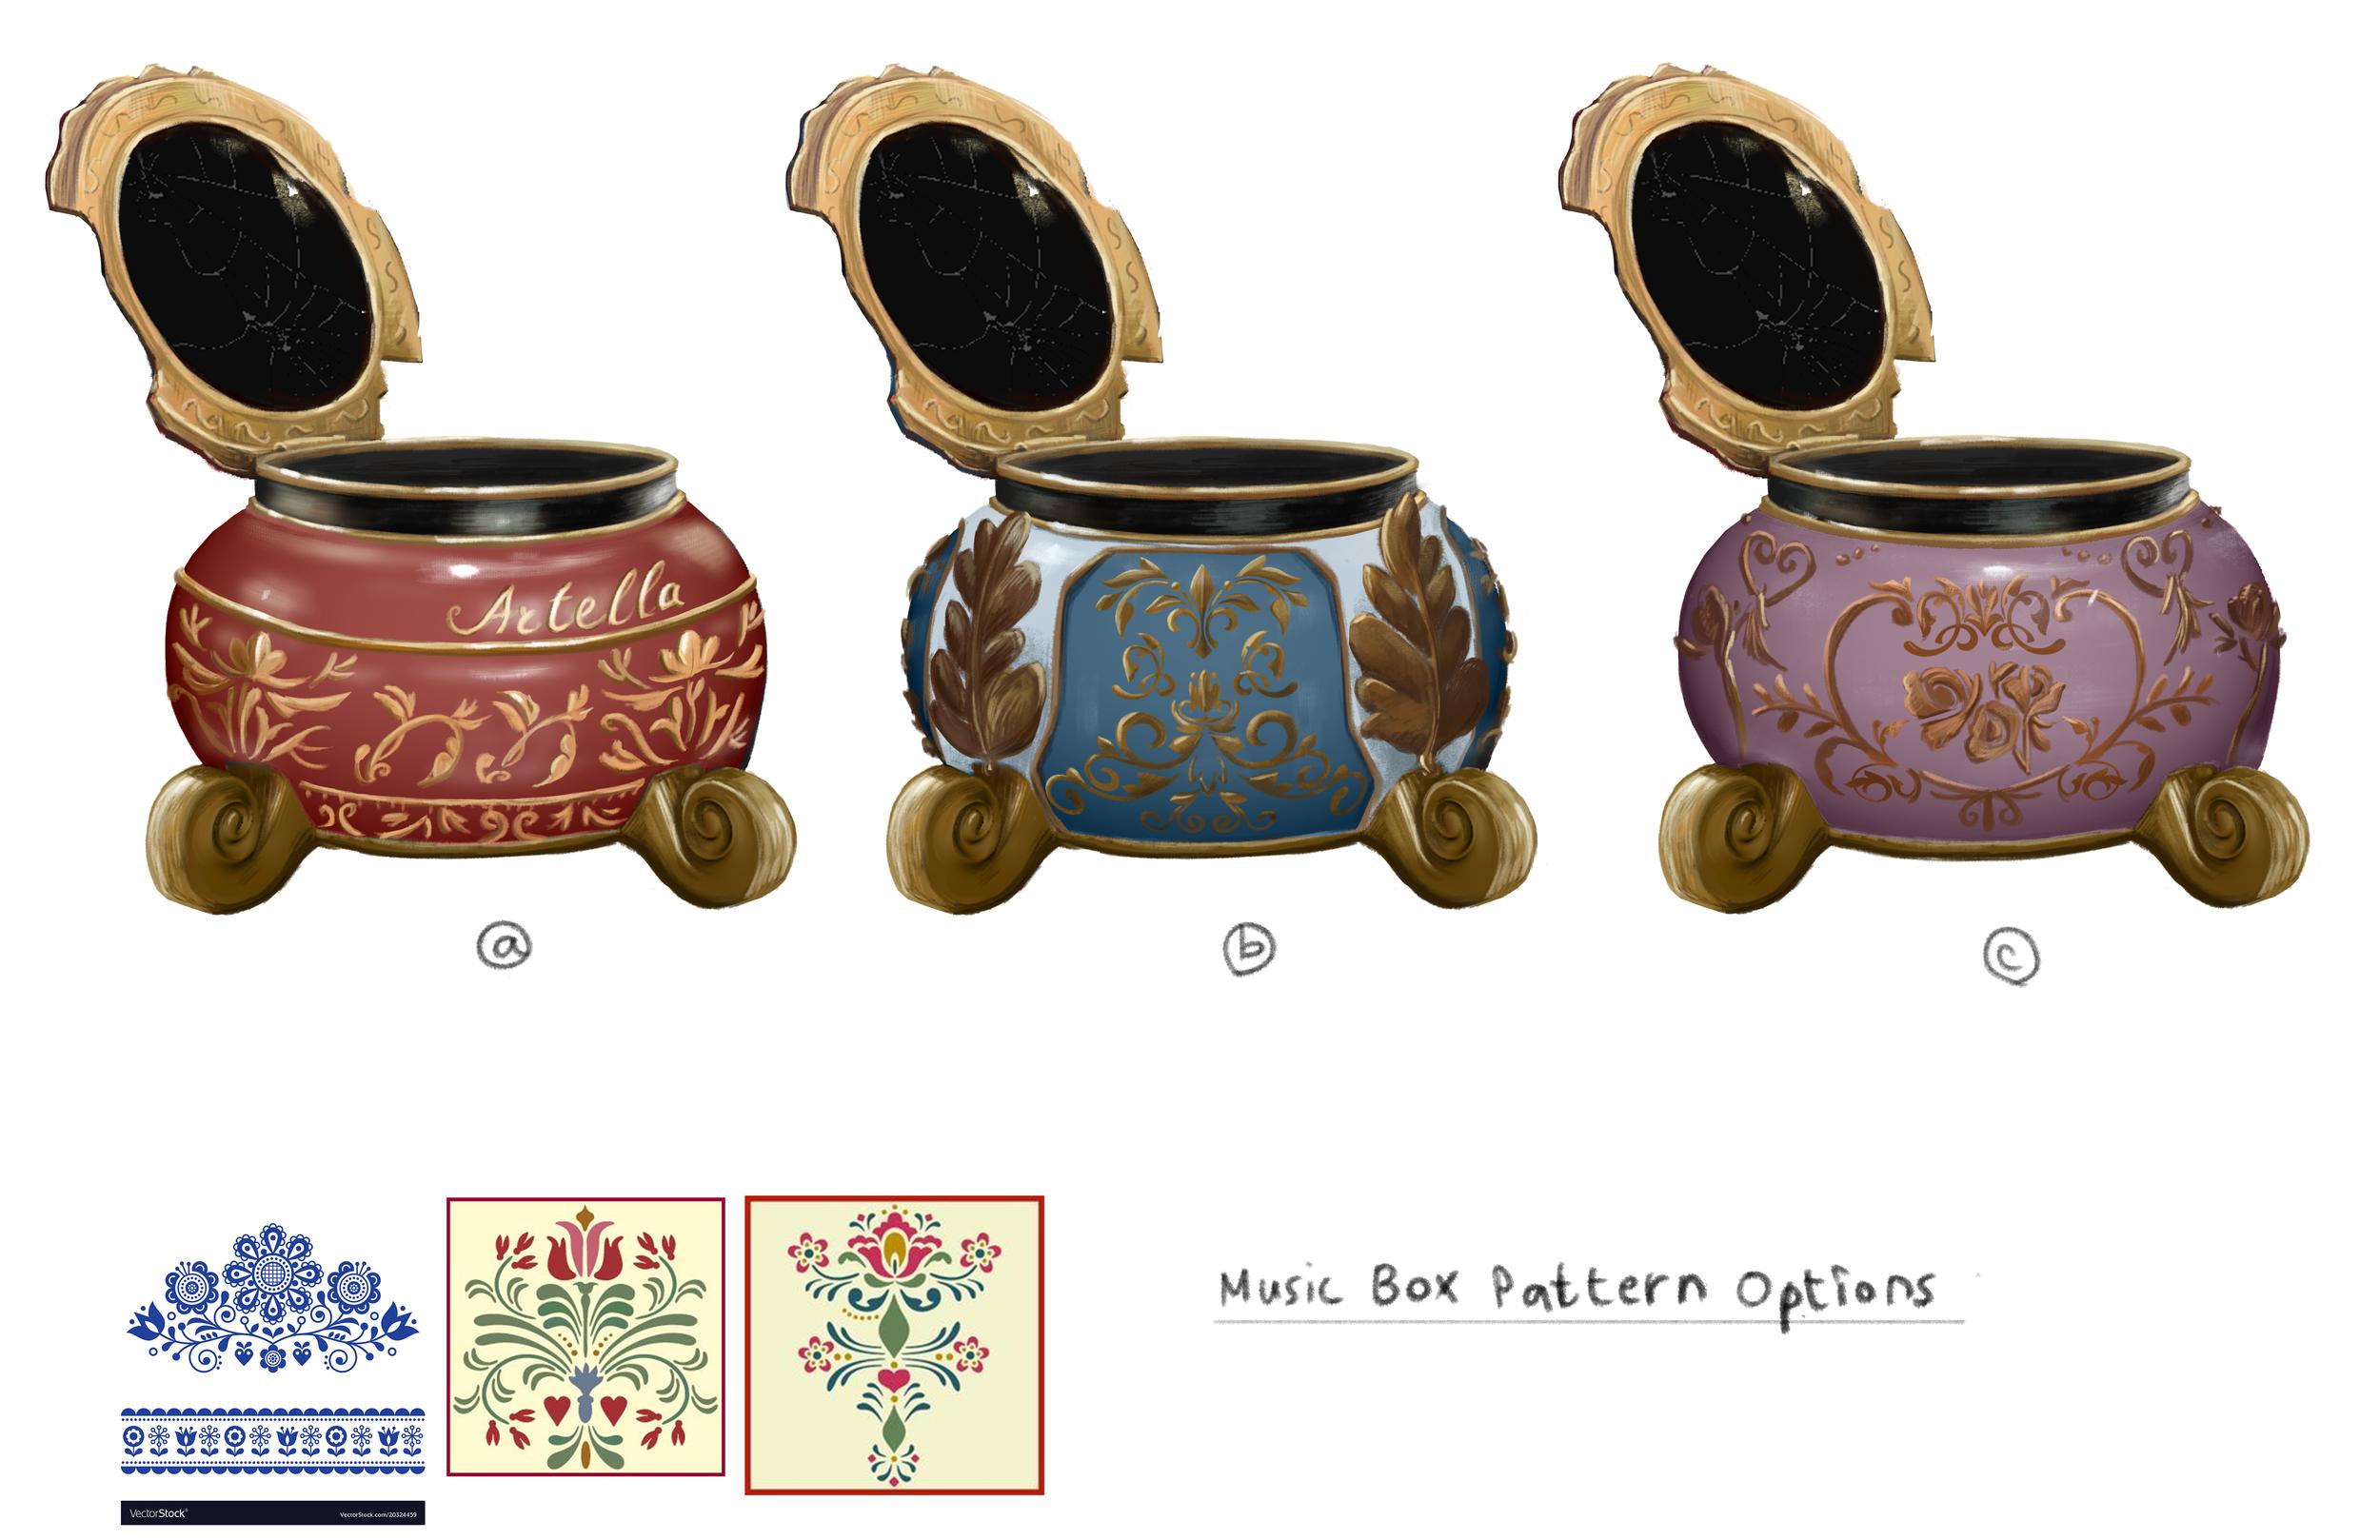 Music Box, Pattern Design Rough Concept